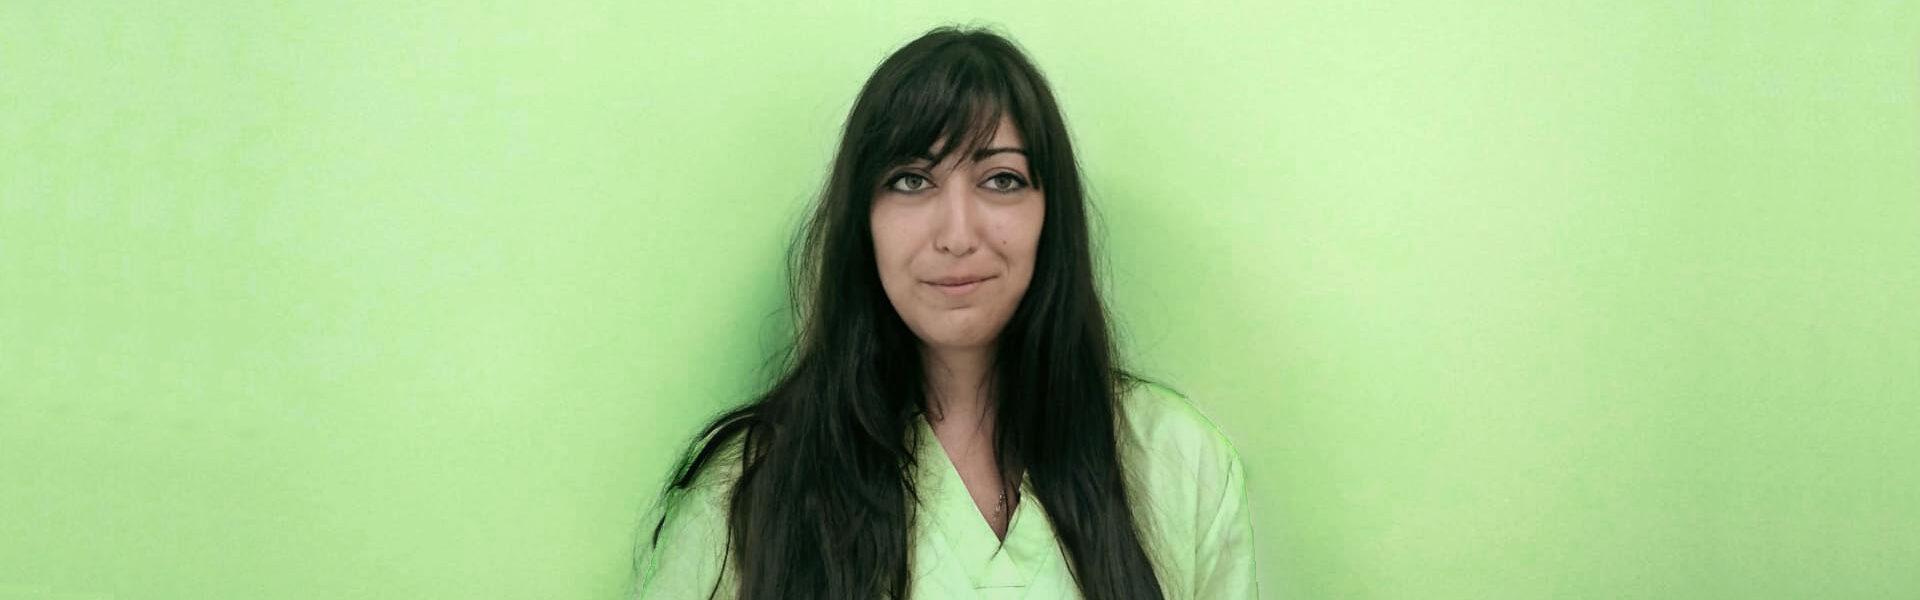 Emanuela Cutri, Neuropsicomotricista